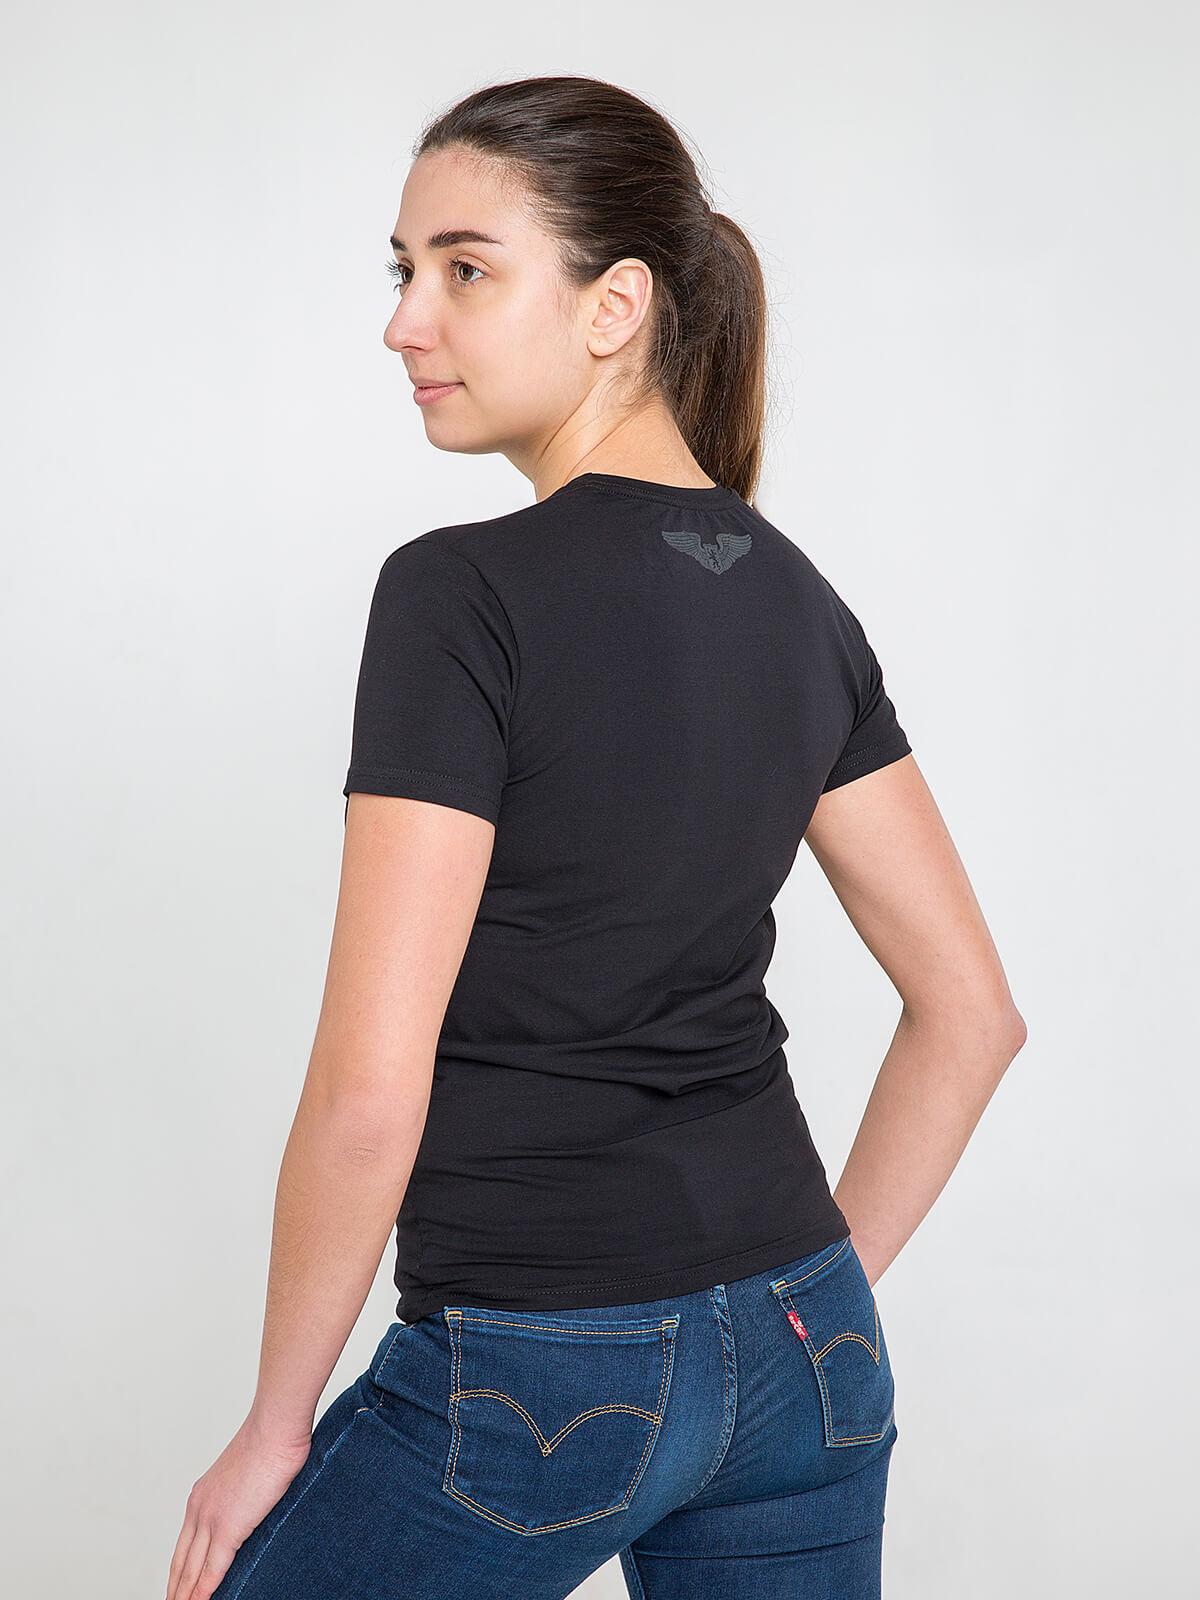 Women's T-Shirt Fight Like Ukrainian. Color black.  Technique of prints applied: silkscreen printing.